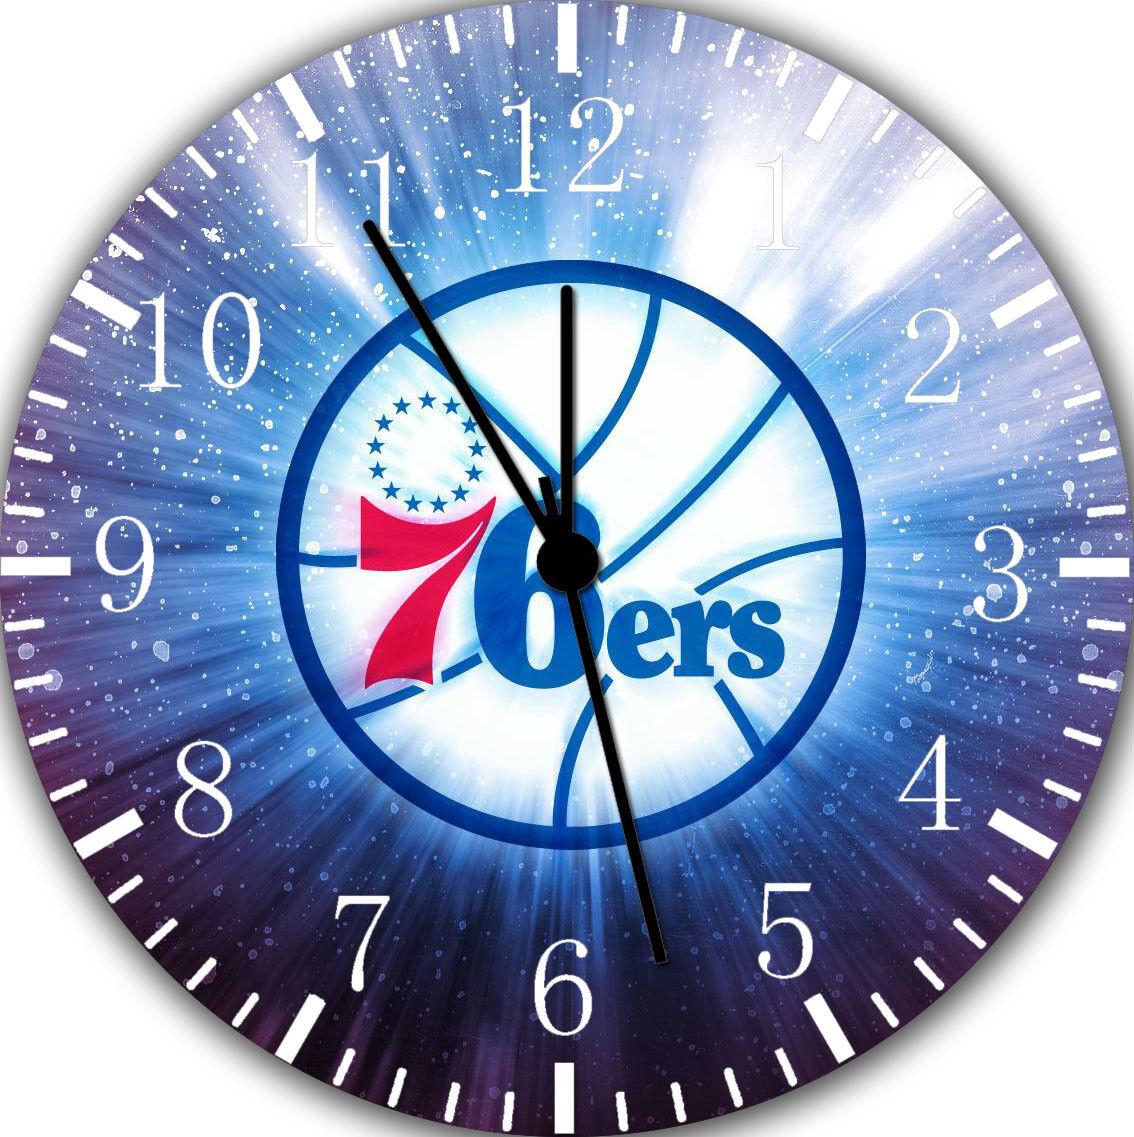 76ers Frameless Borderless Wall Clock Nice For Gifts or Decor E273